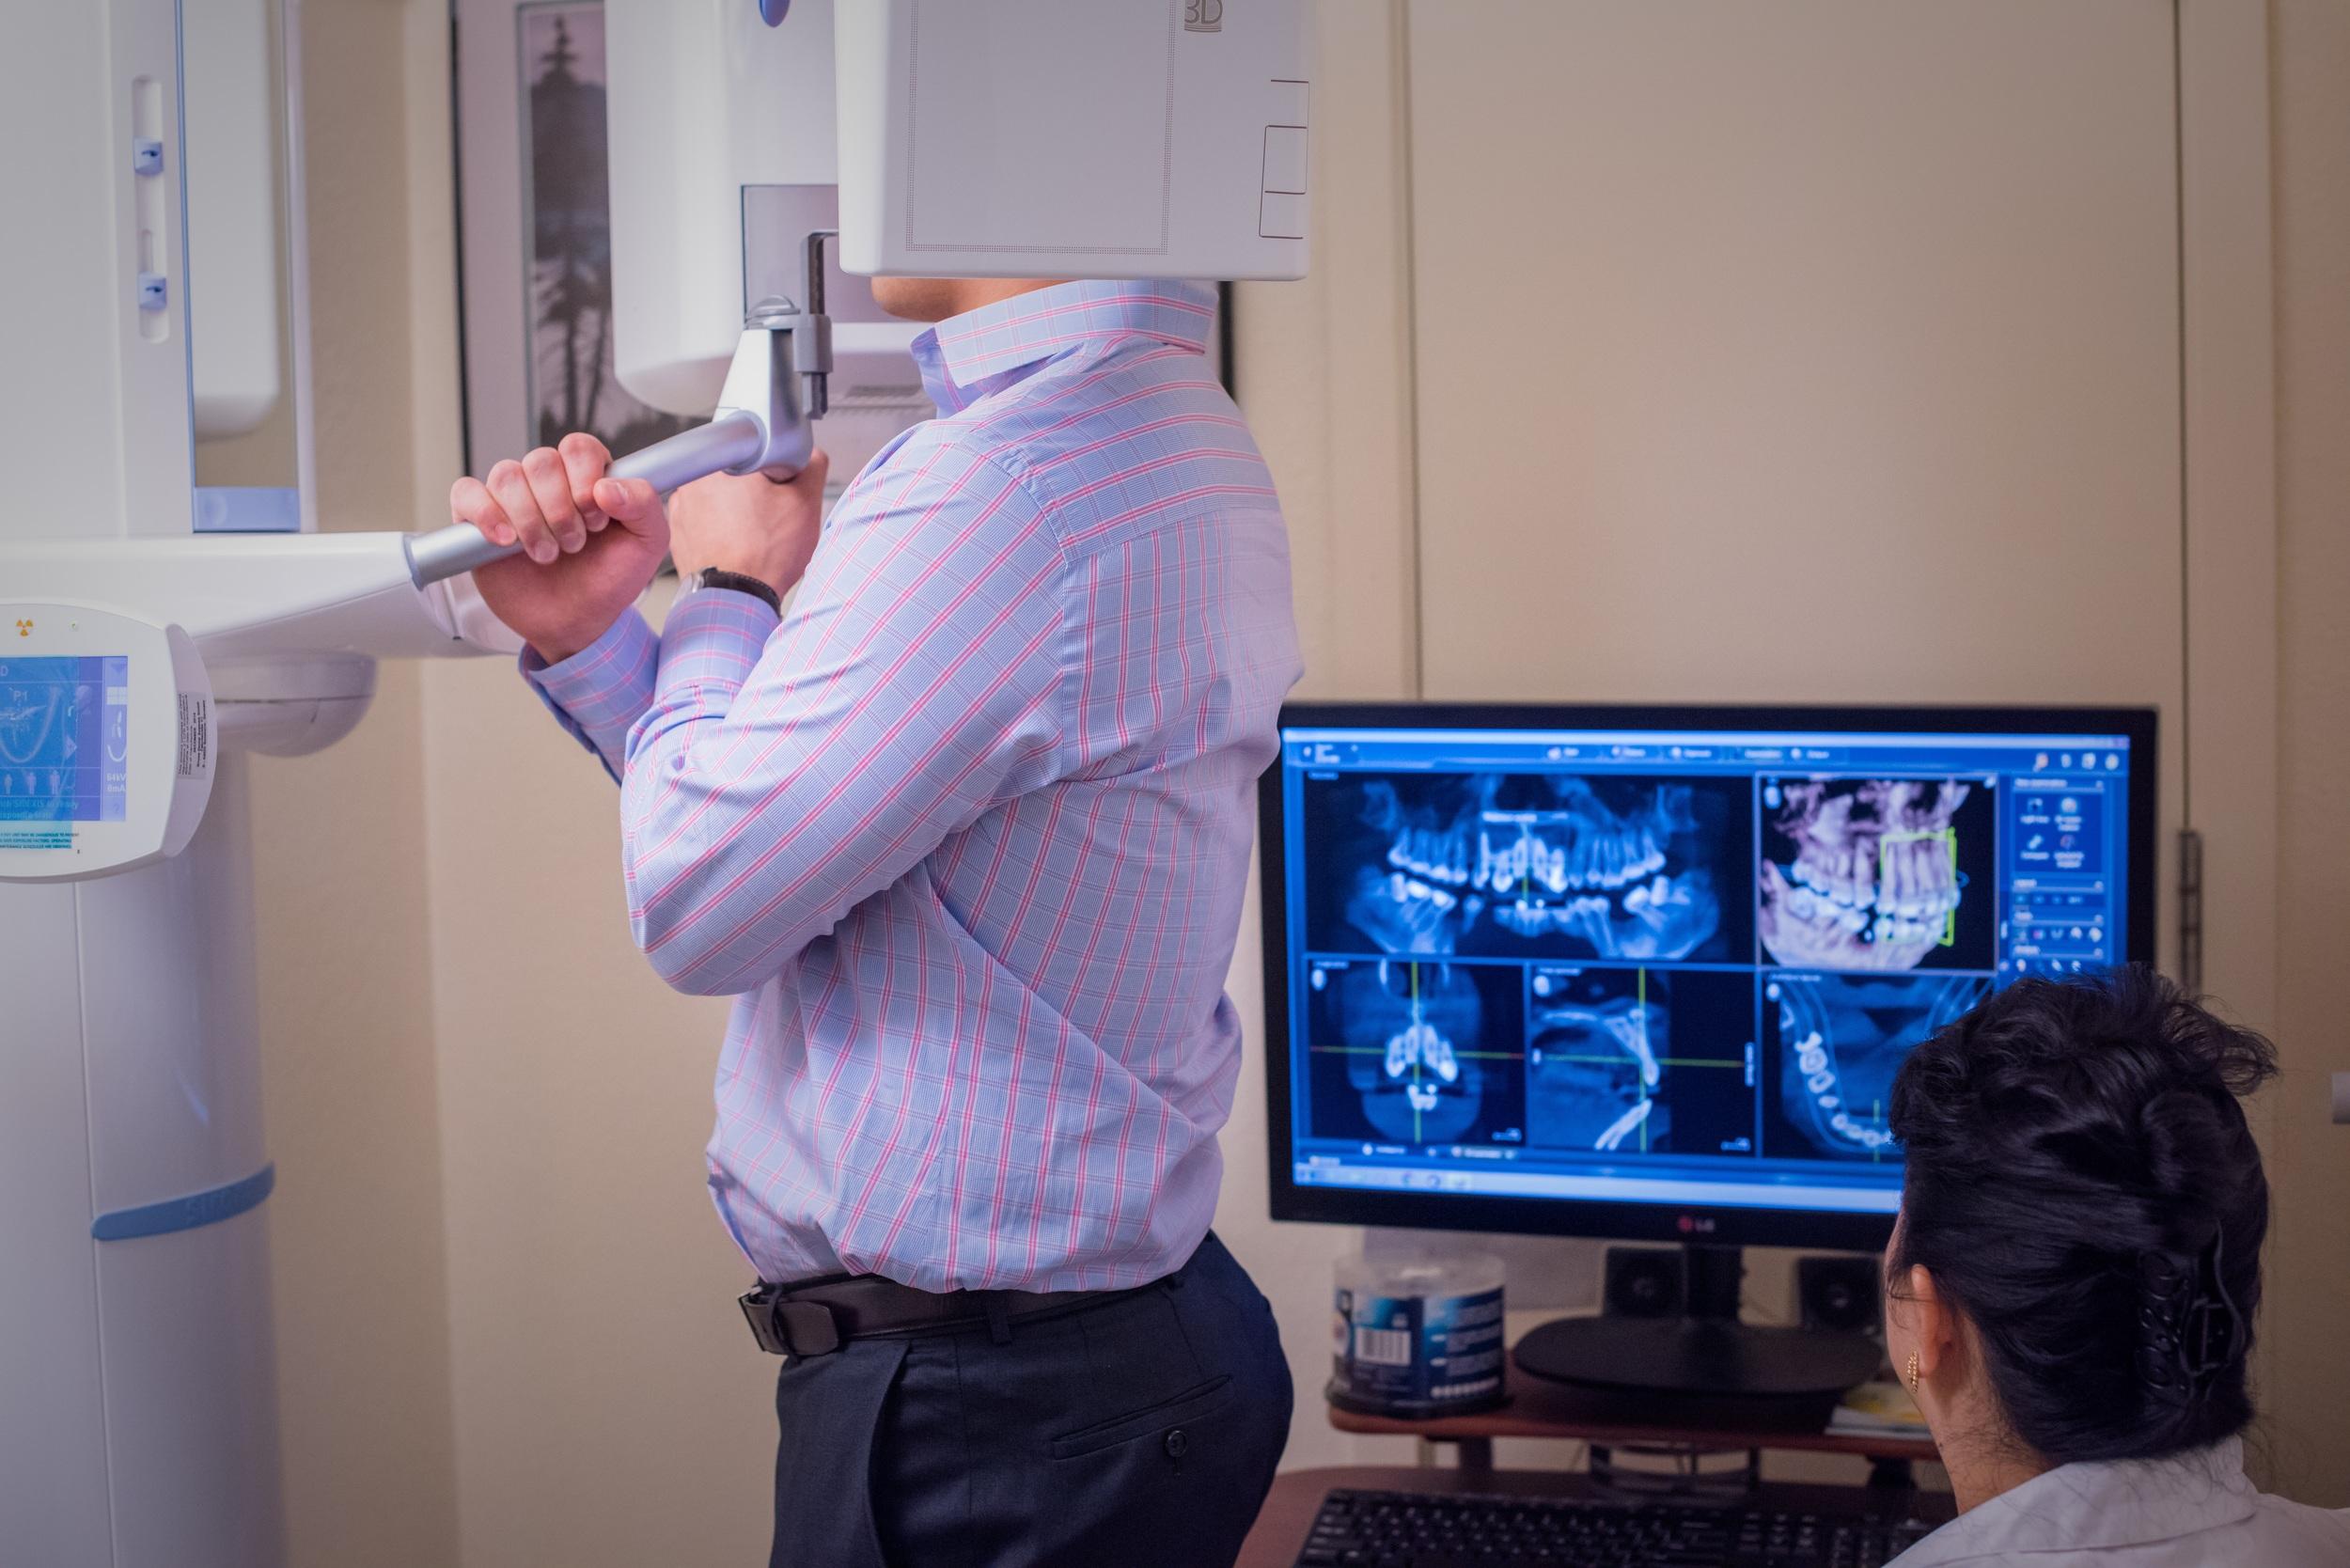 Sirona Orthophos XG 3D Imaging (in use)